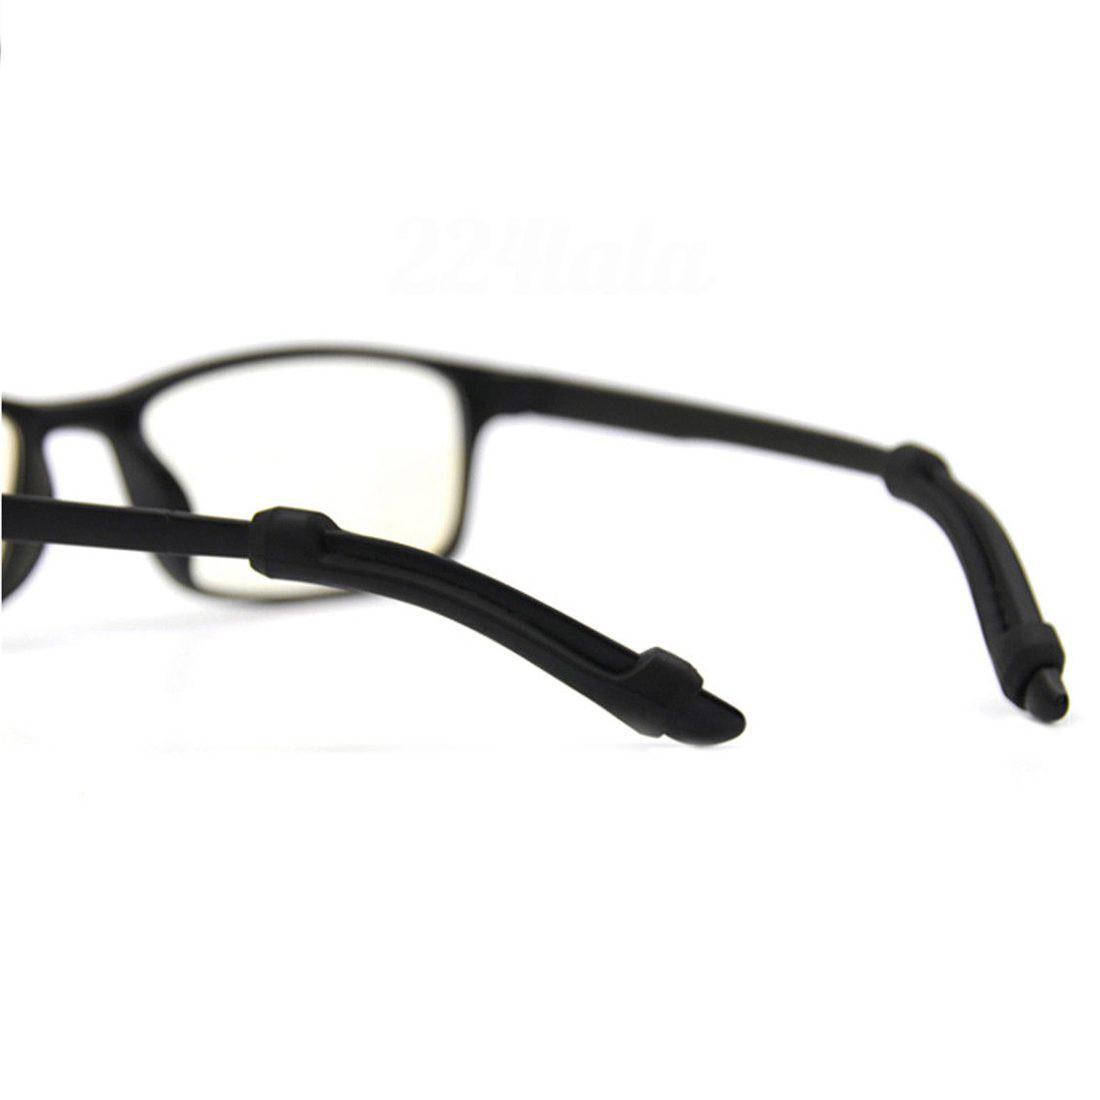 6X Hook Tip Eyeglass / Glasses / Spectacles Ear Grip Anti Slip Black